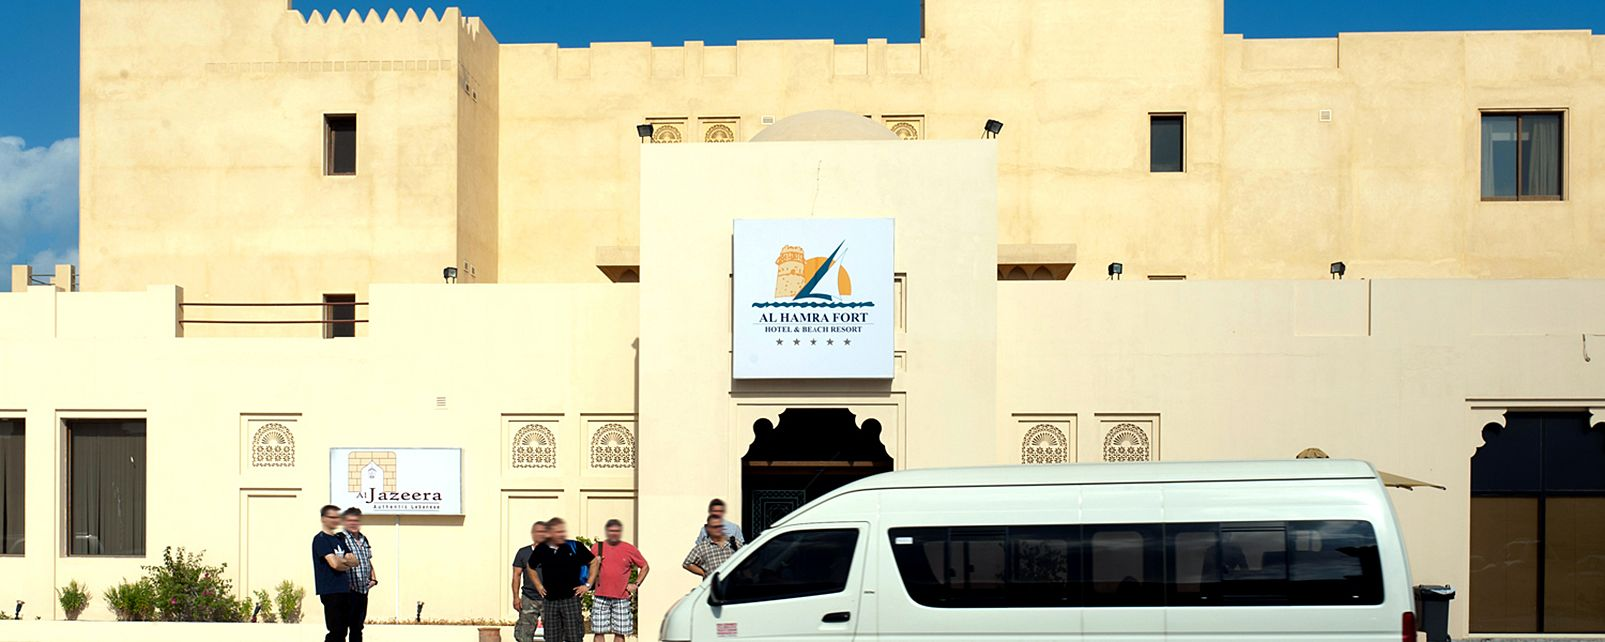 Hotel Al Hamra Fort